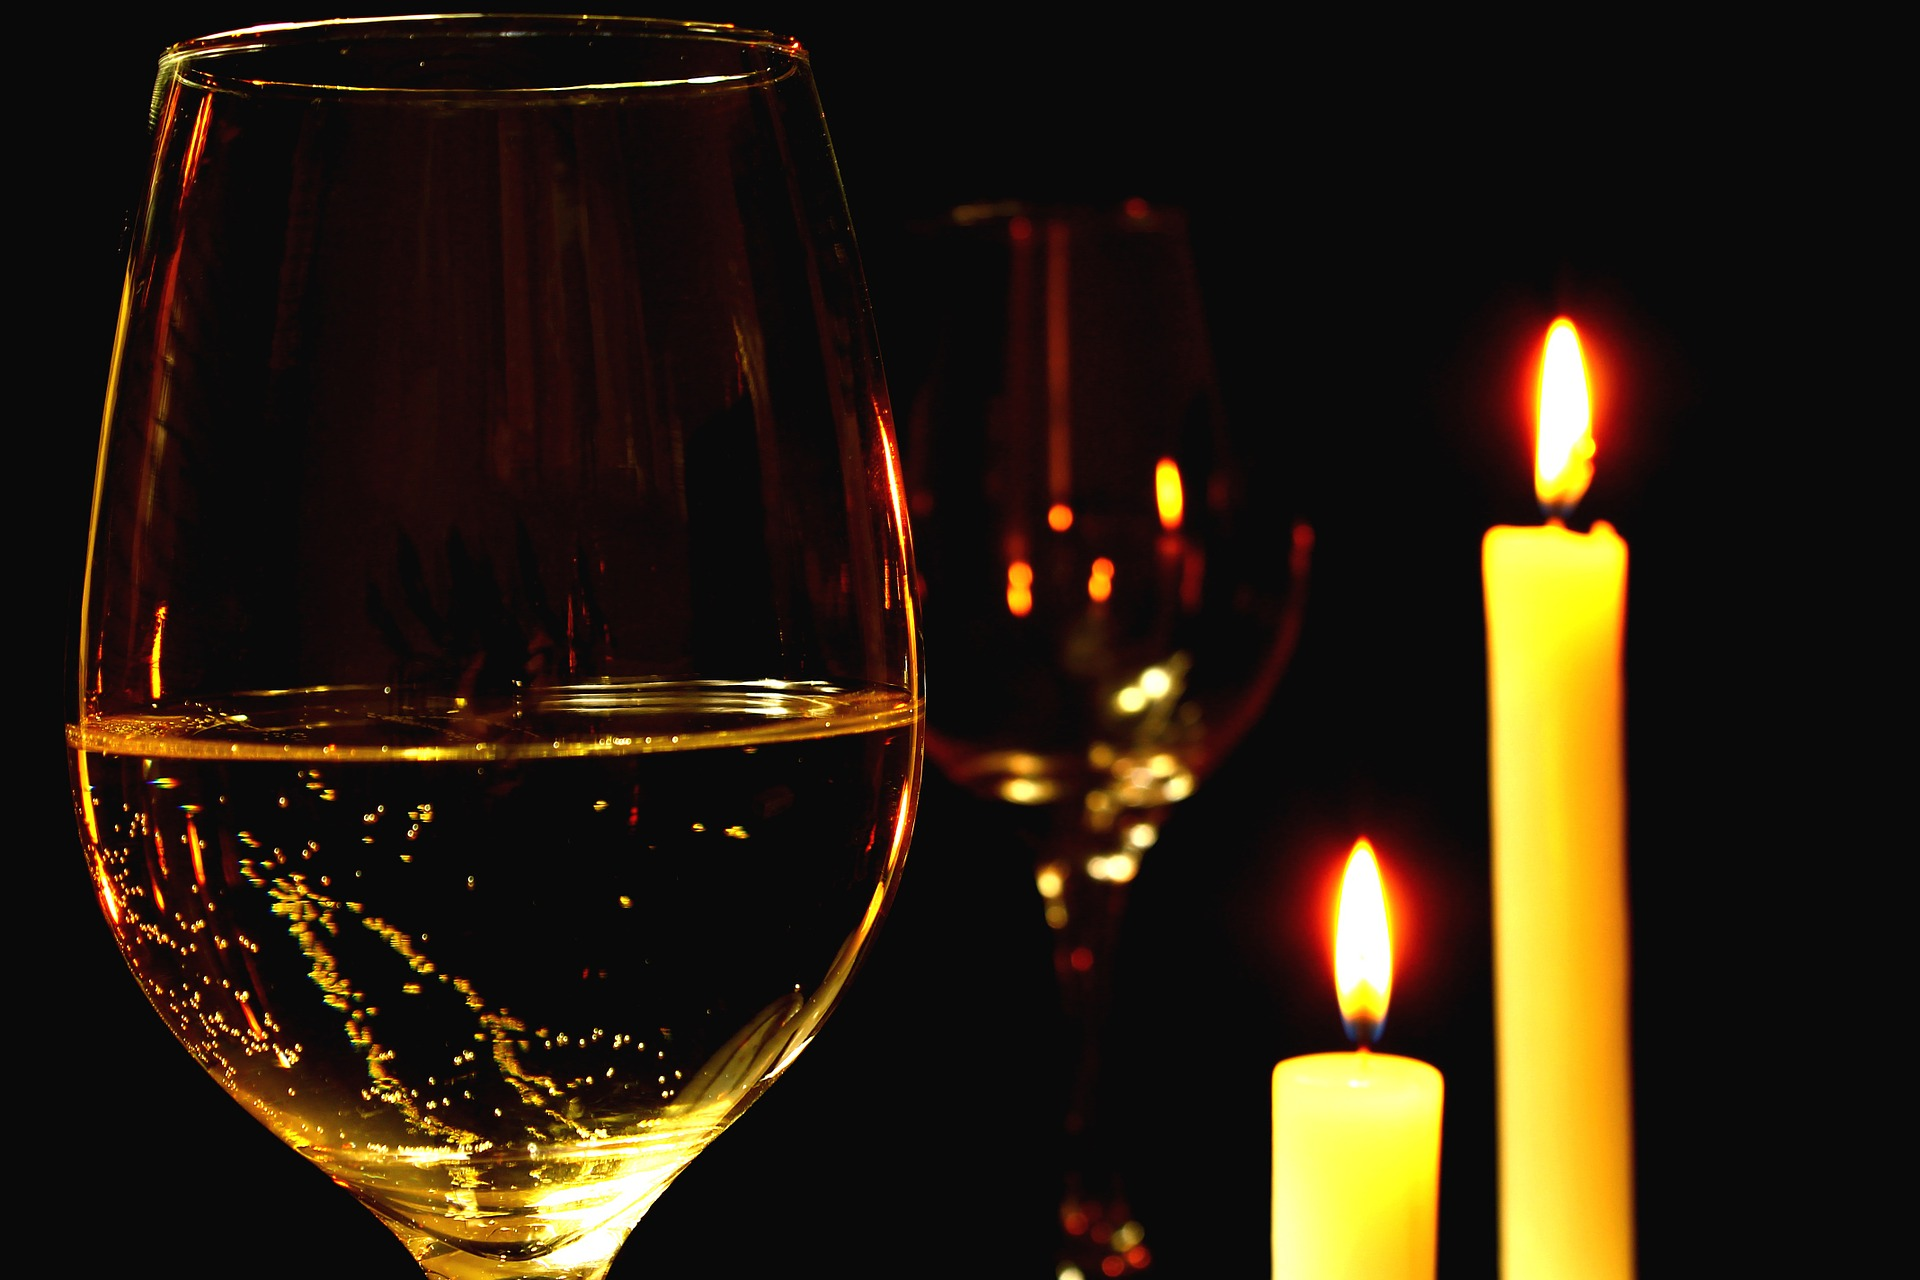 Картинки ужин при свечах романтика, открытки открытка